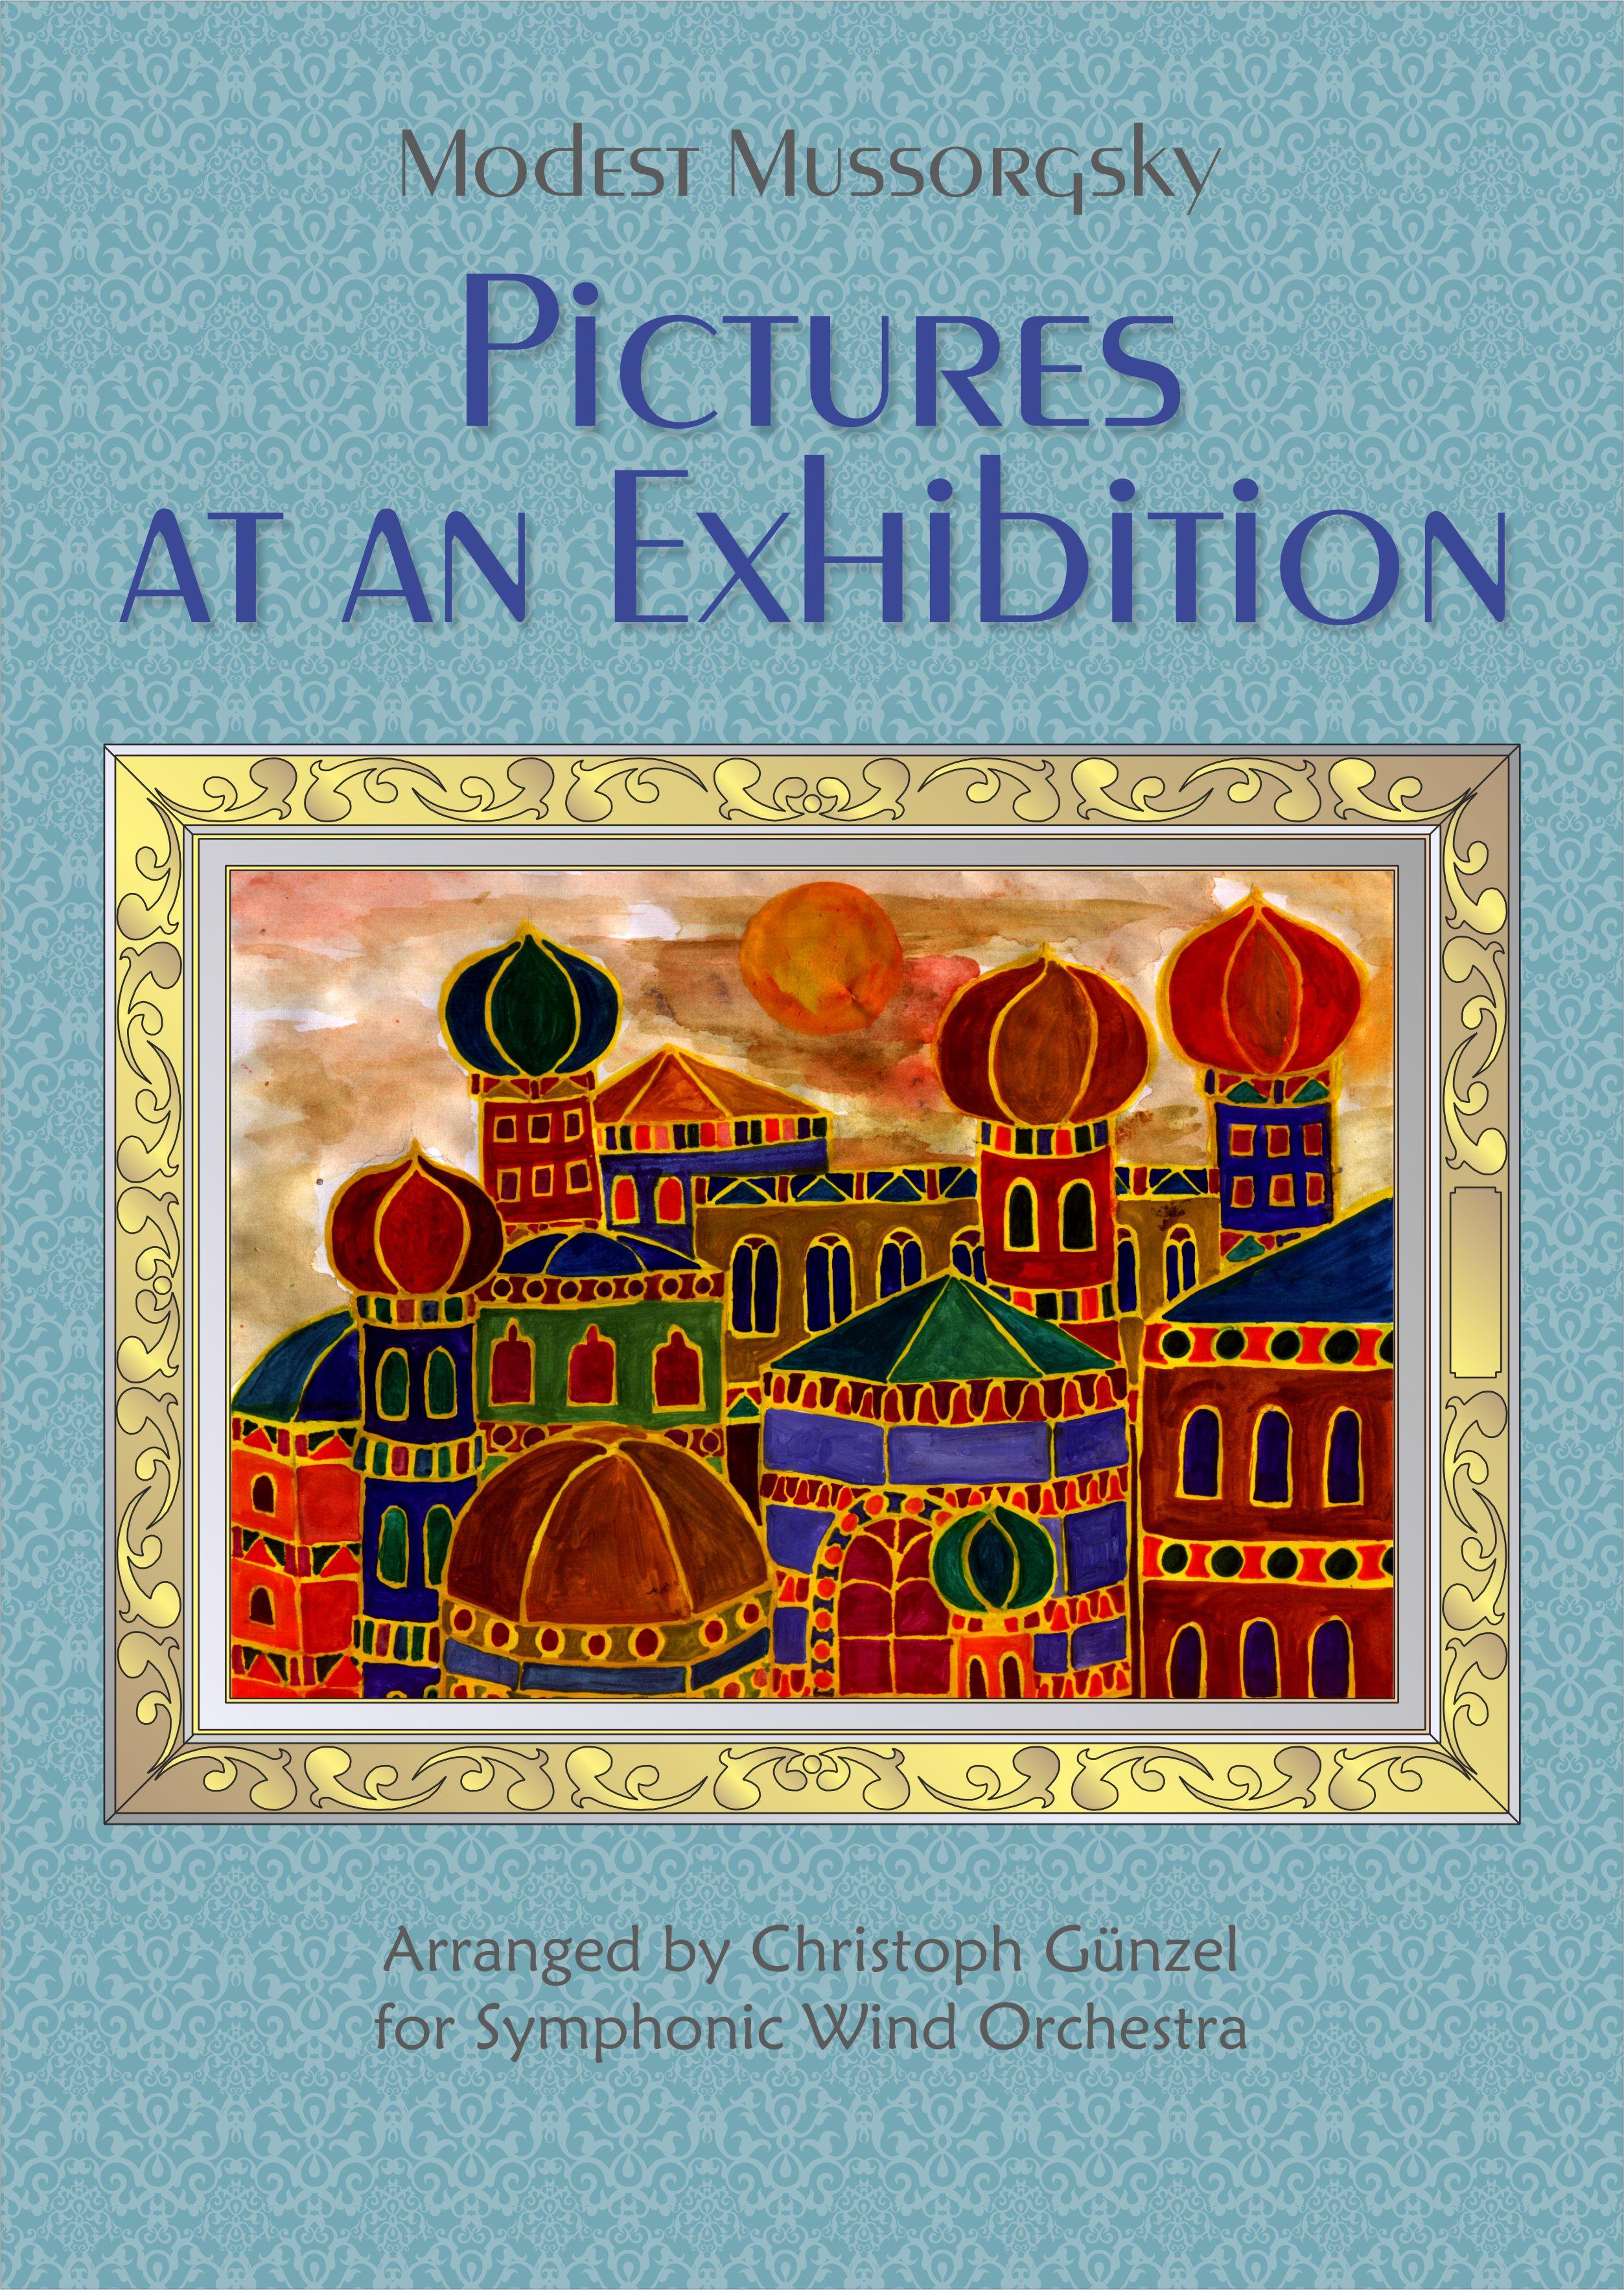 Pictures atan Exhibition